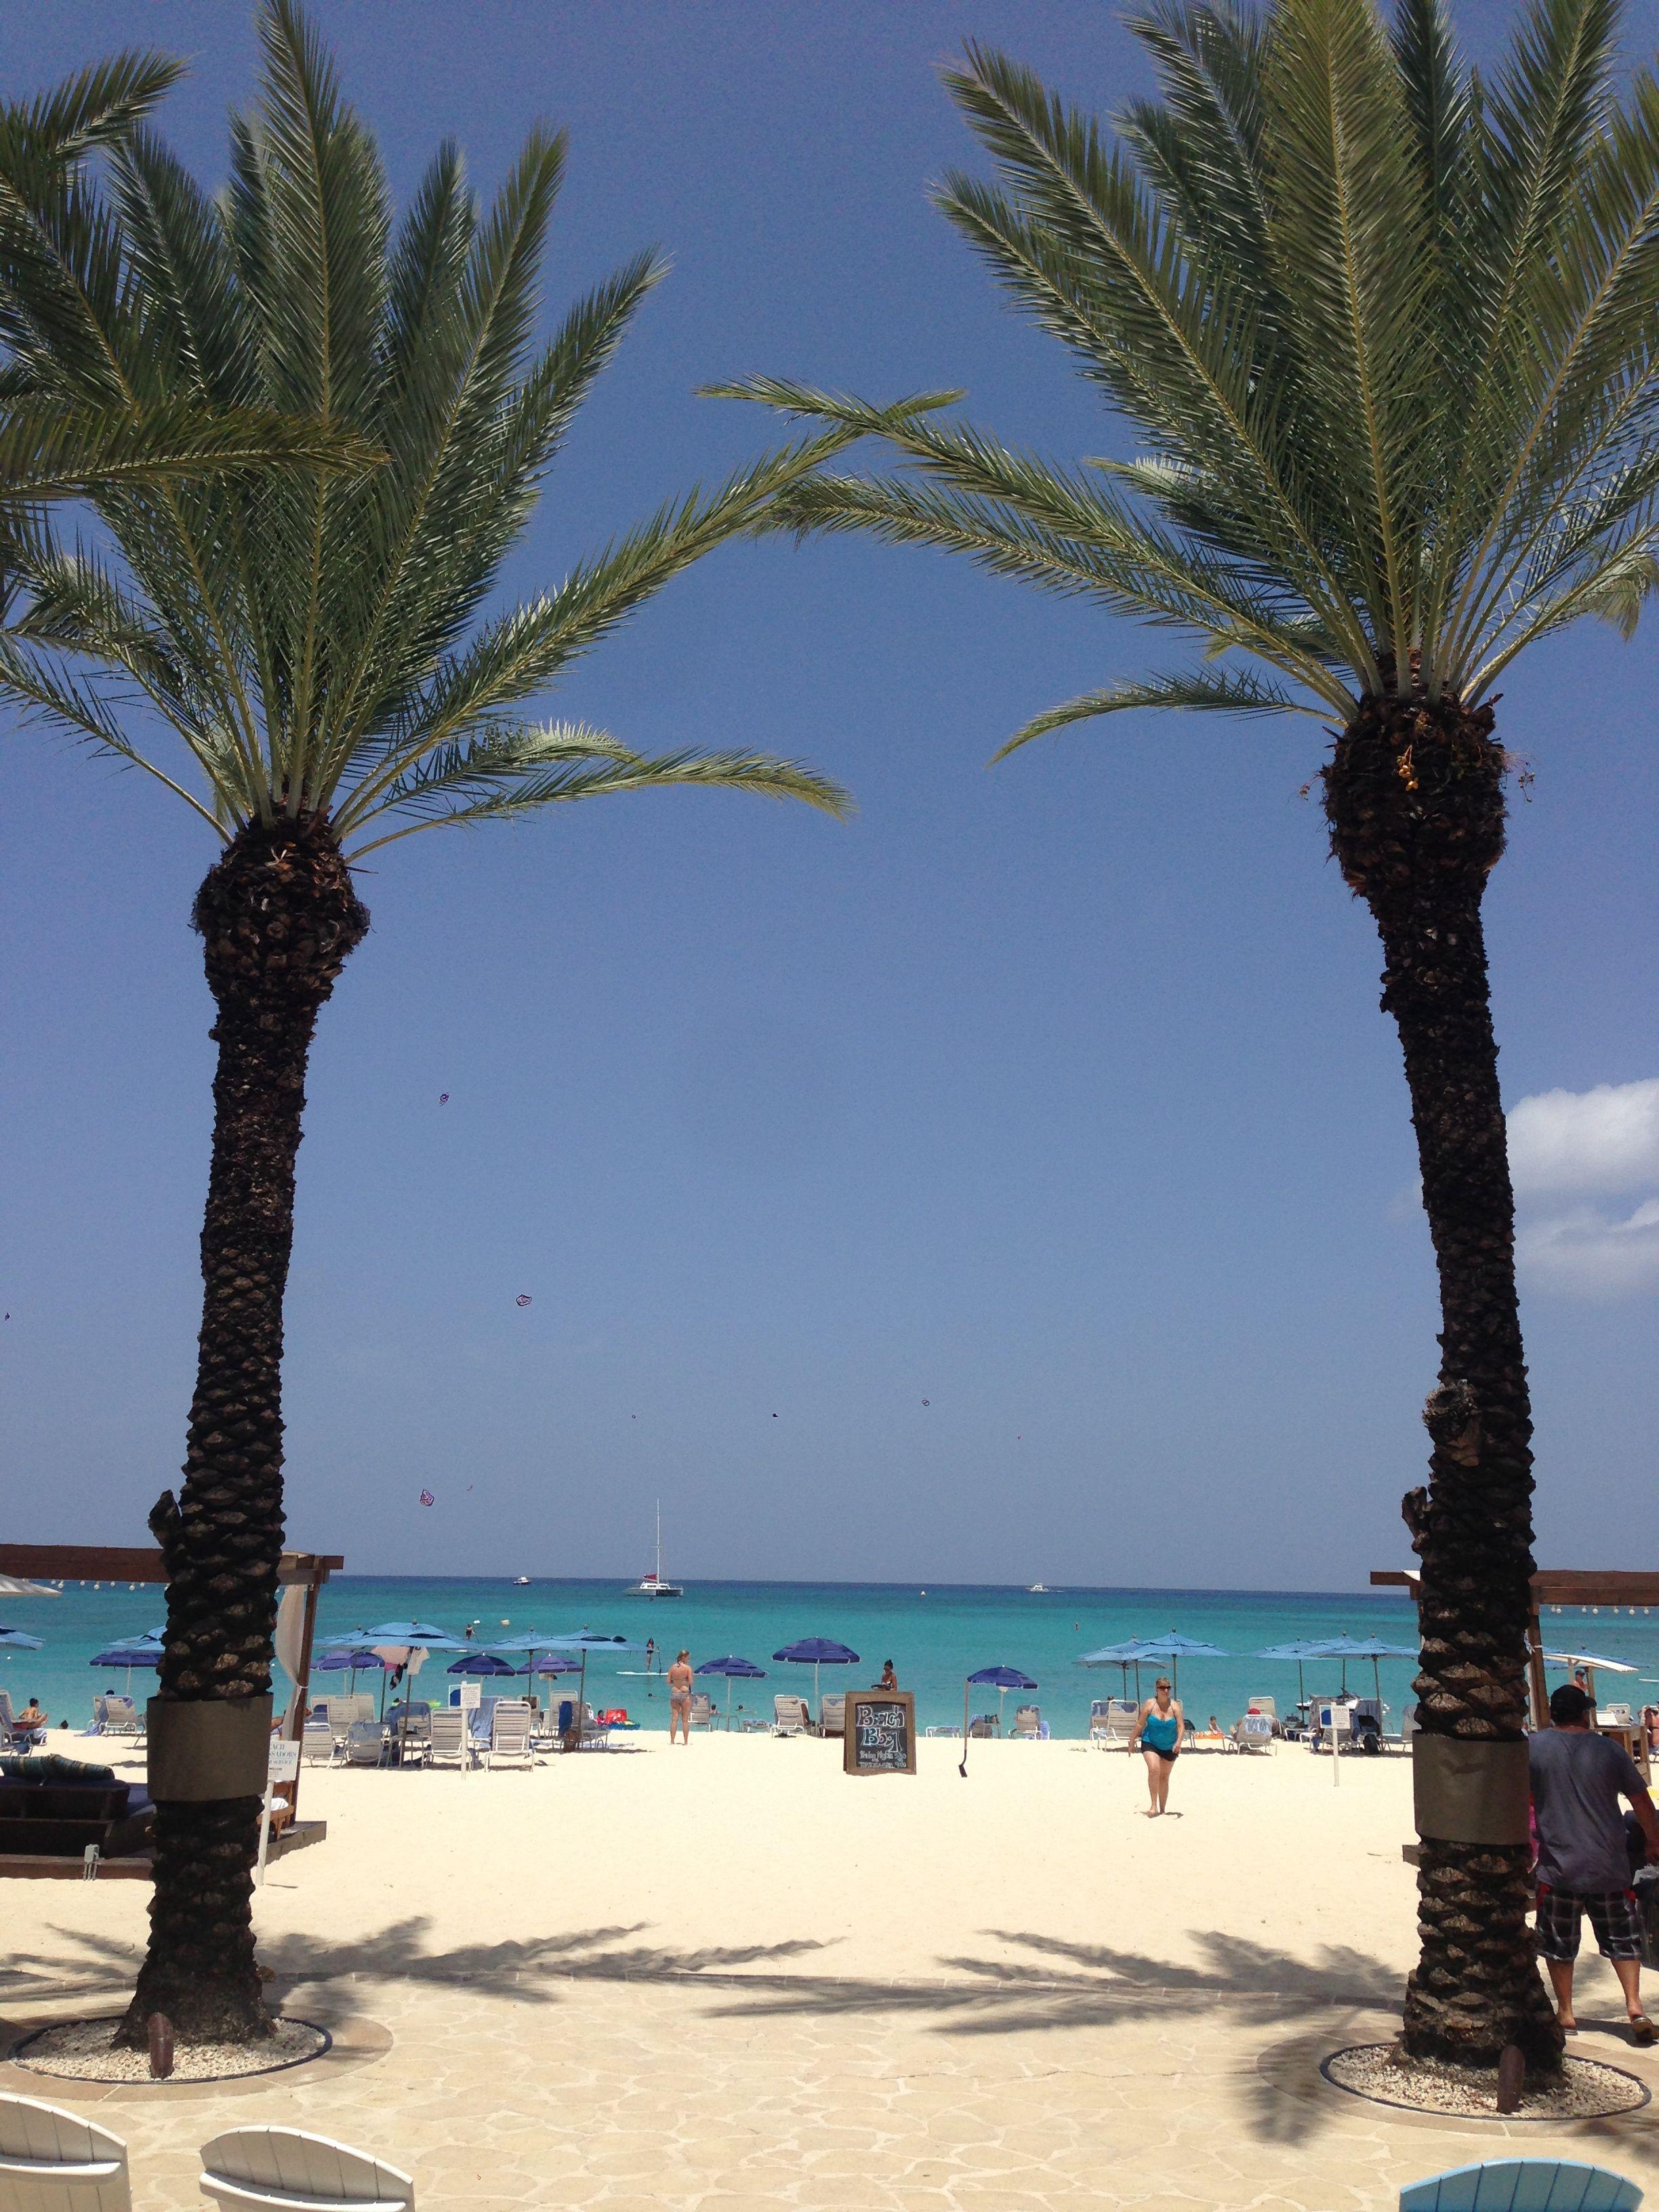 Blue Cayman